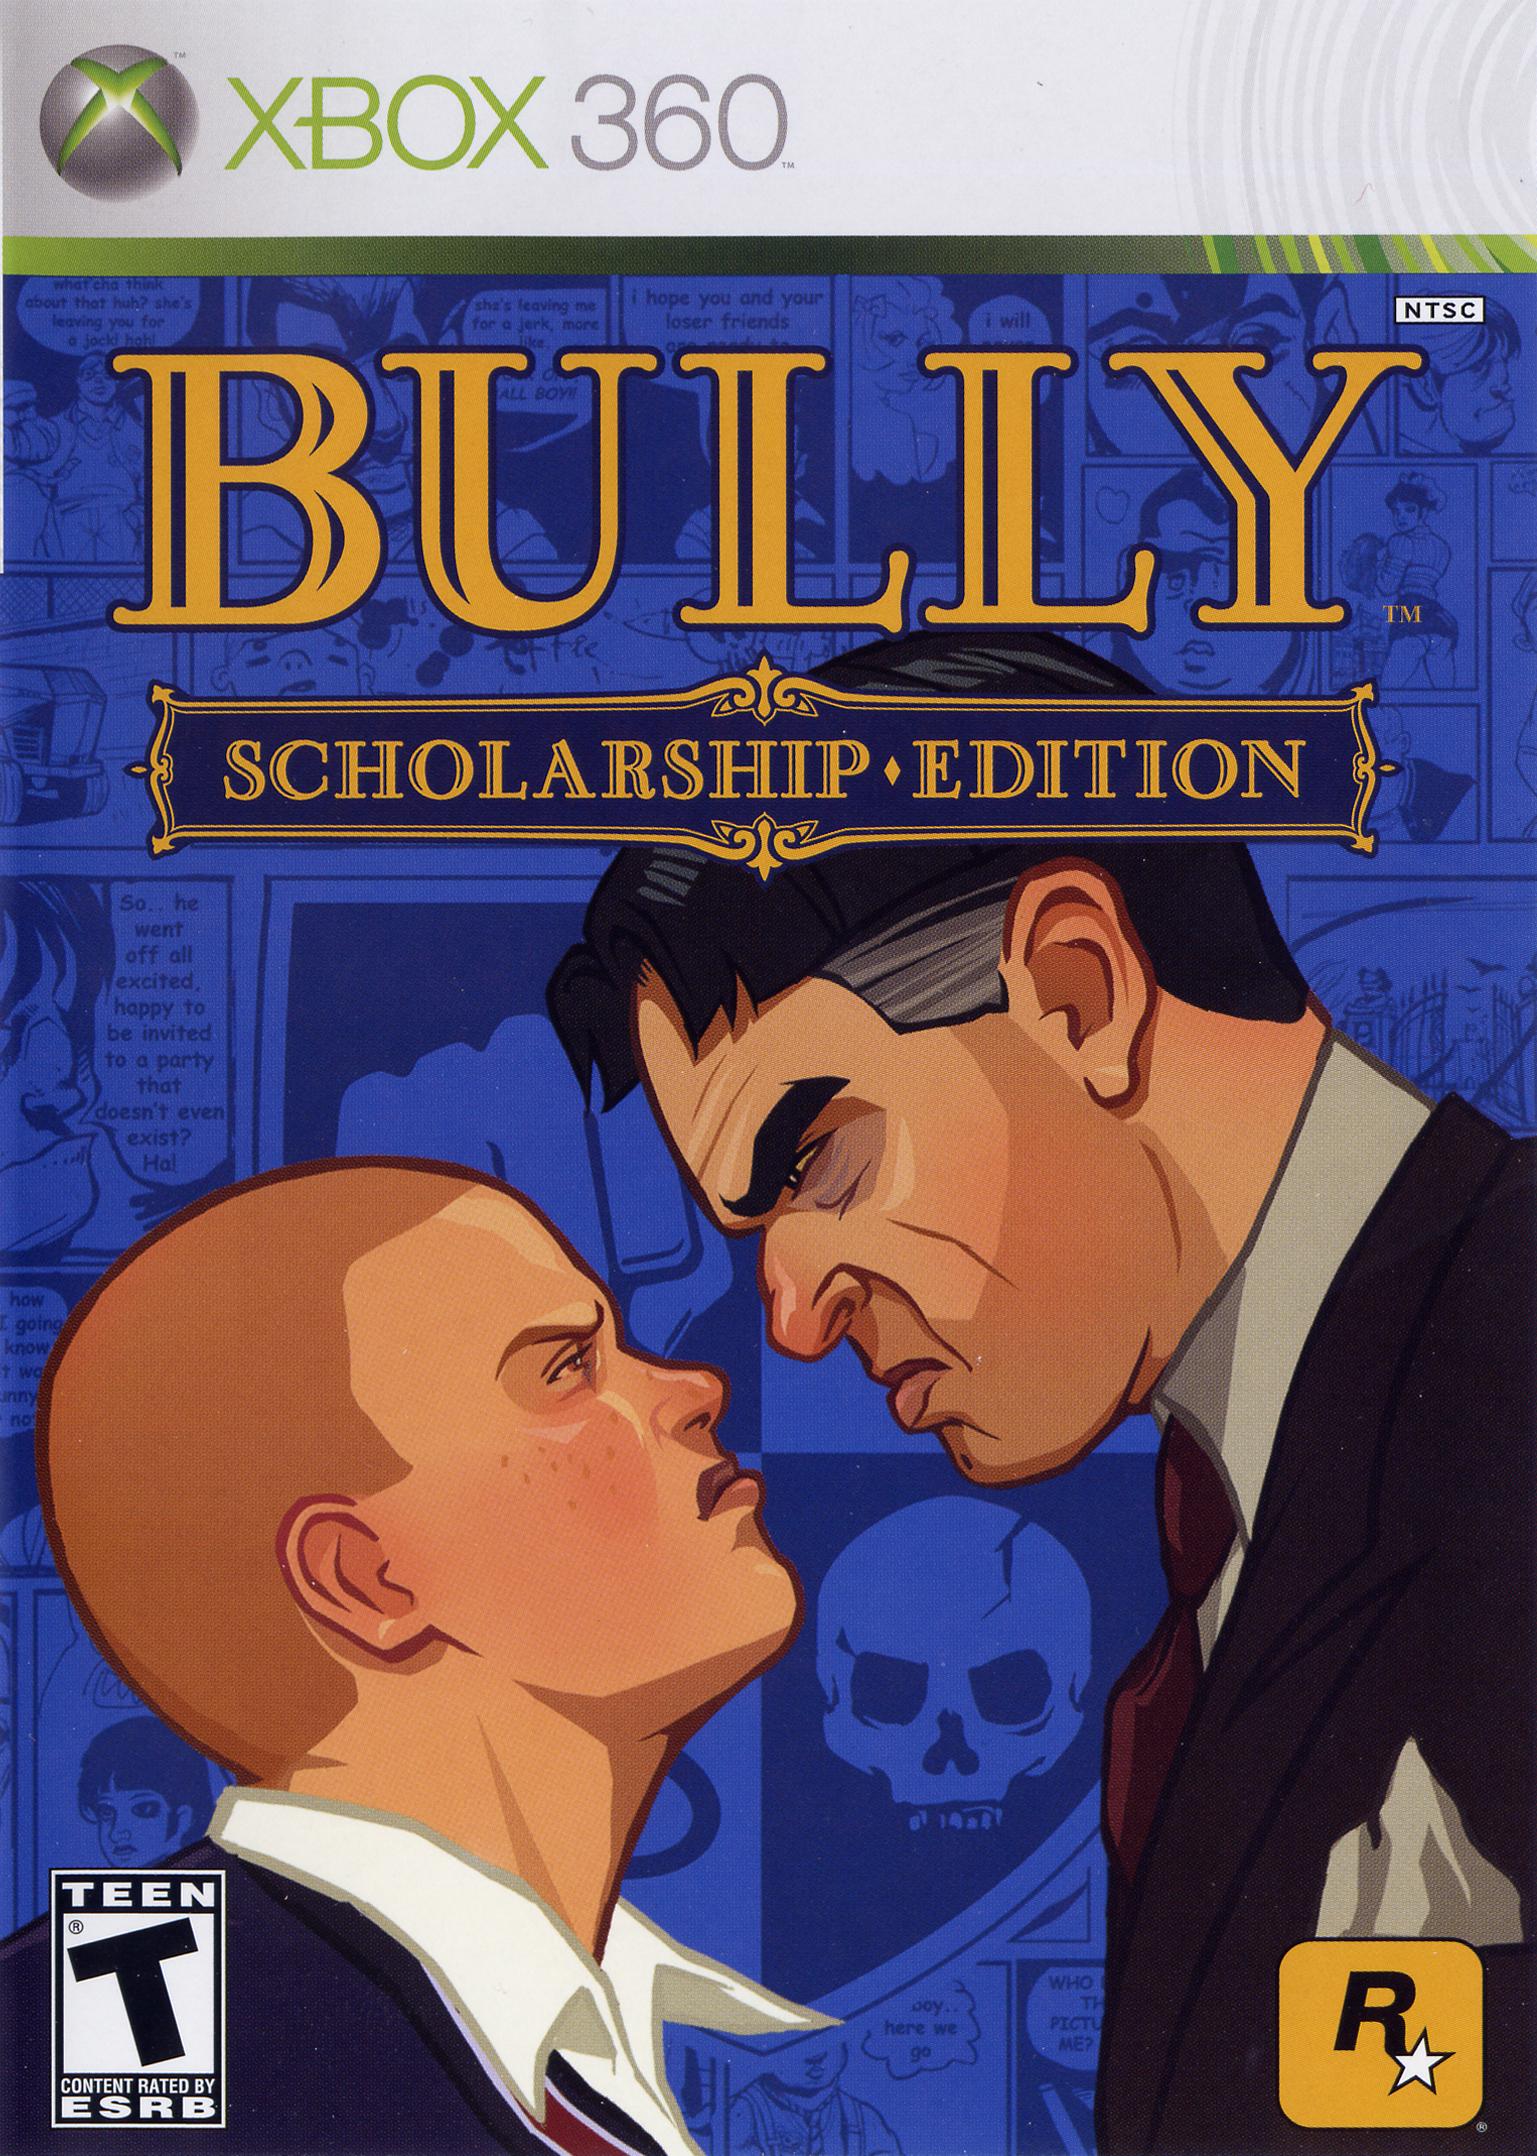 Bully Scholarship Edition/XBox 360